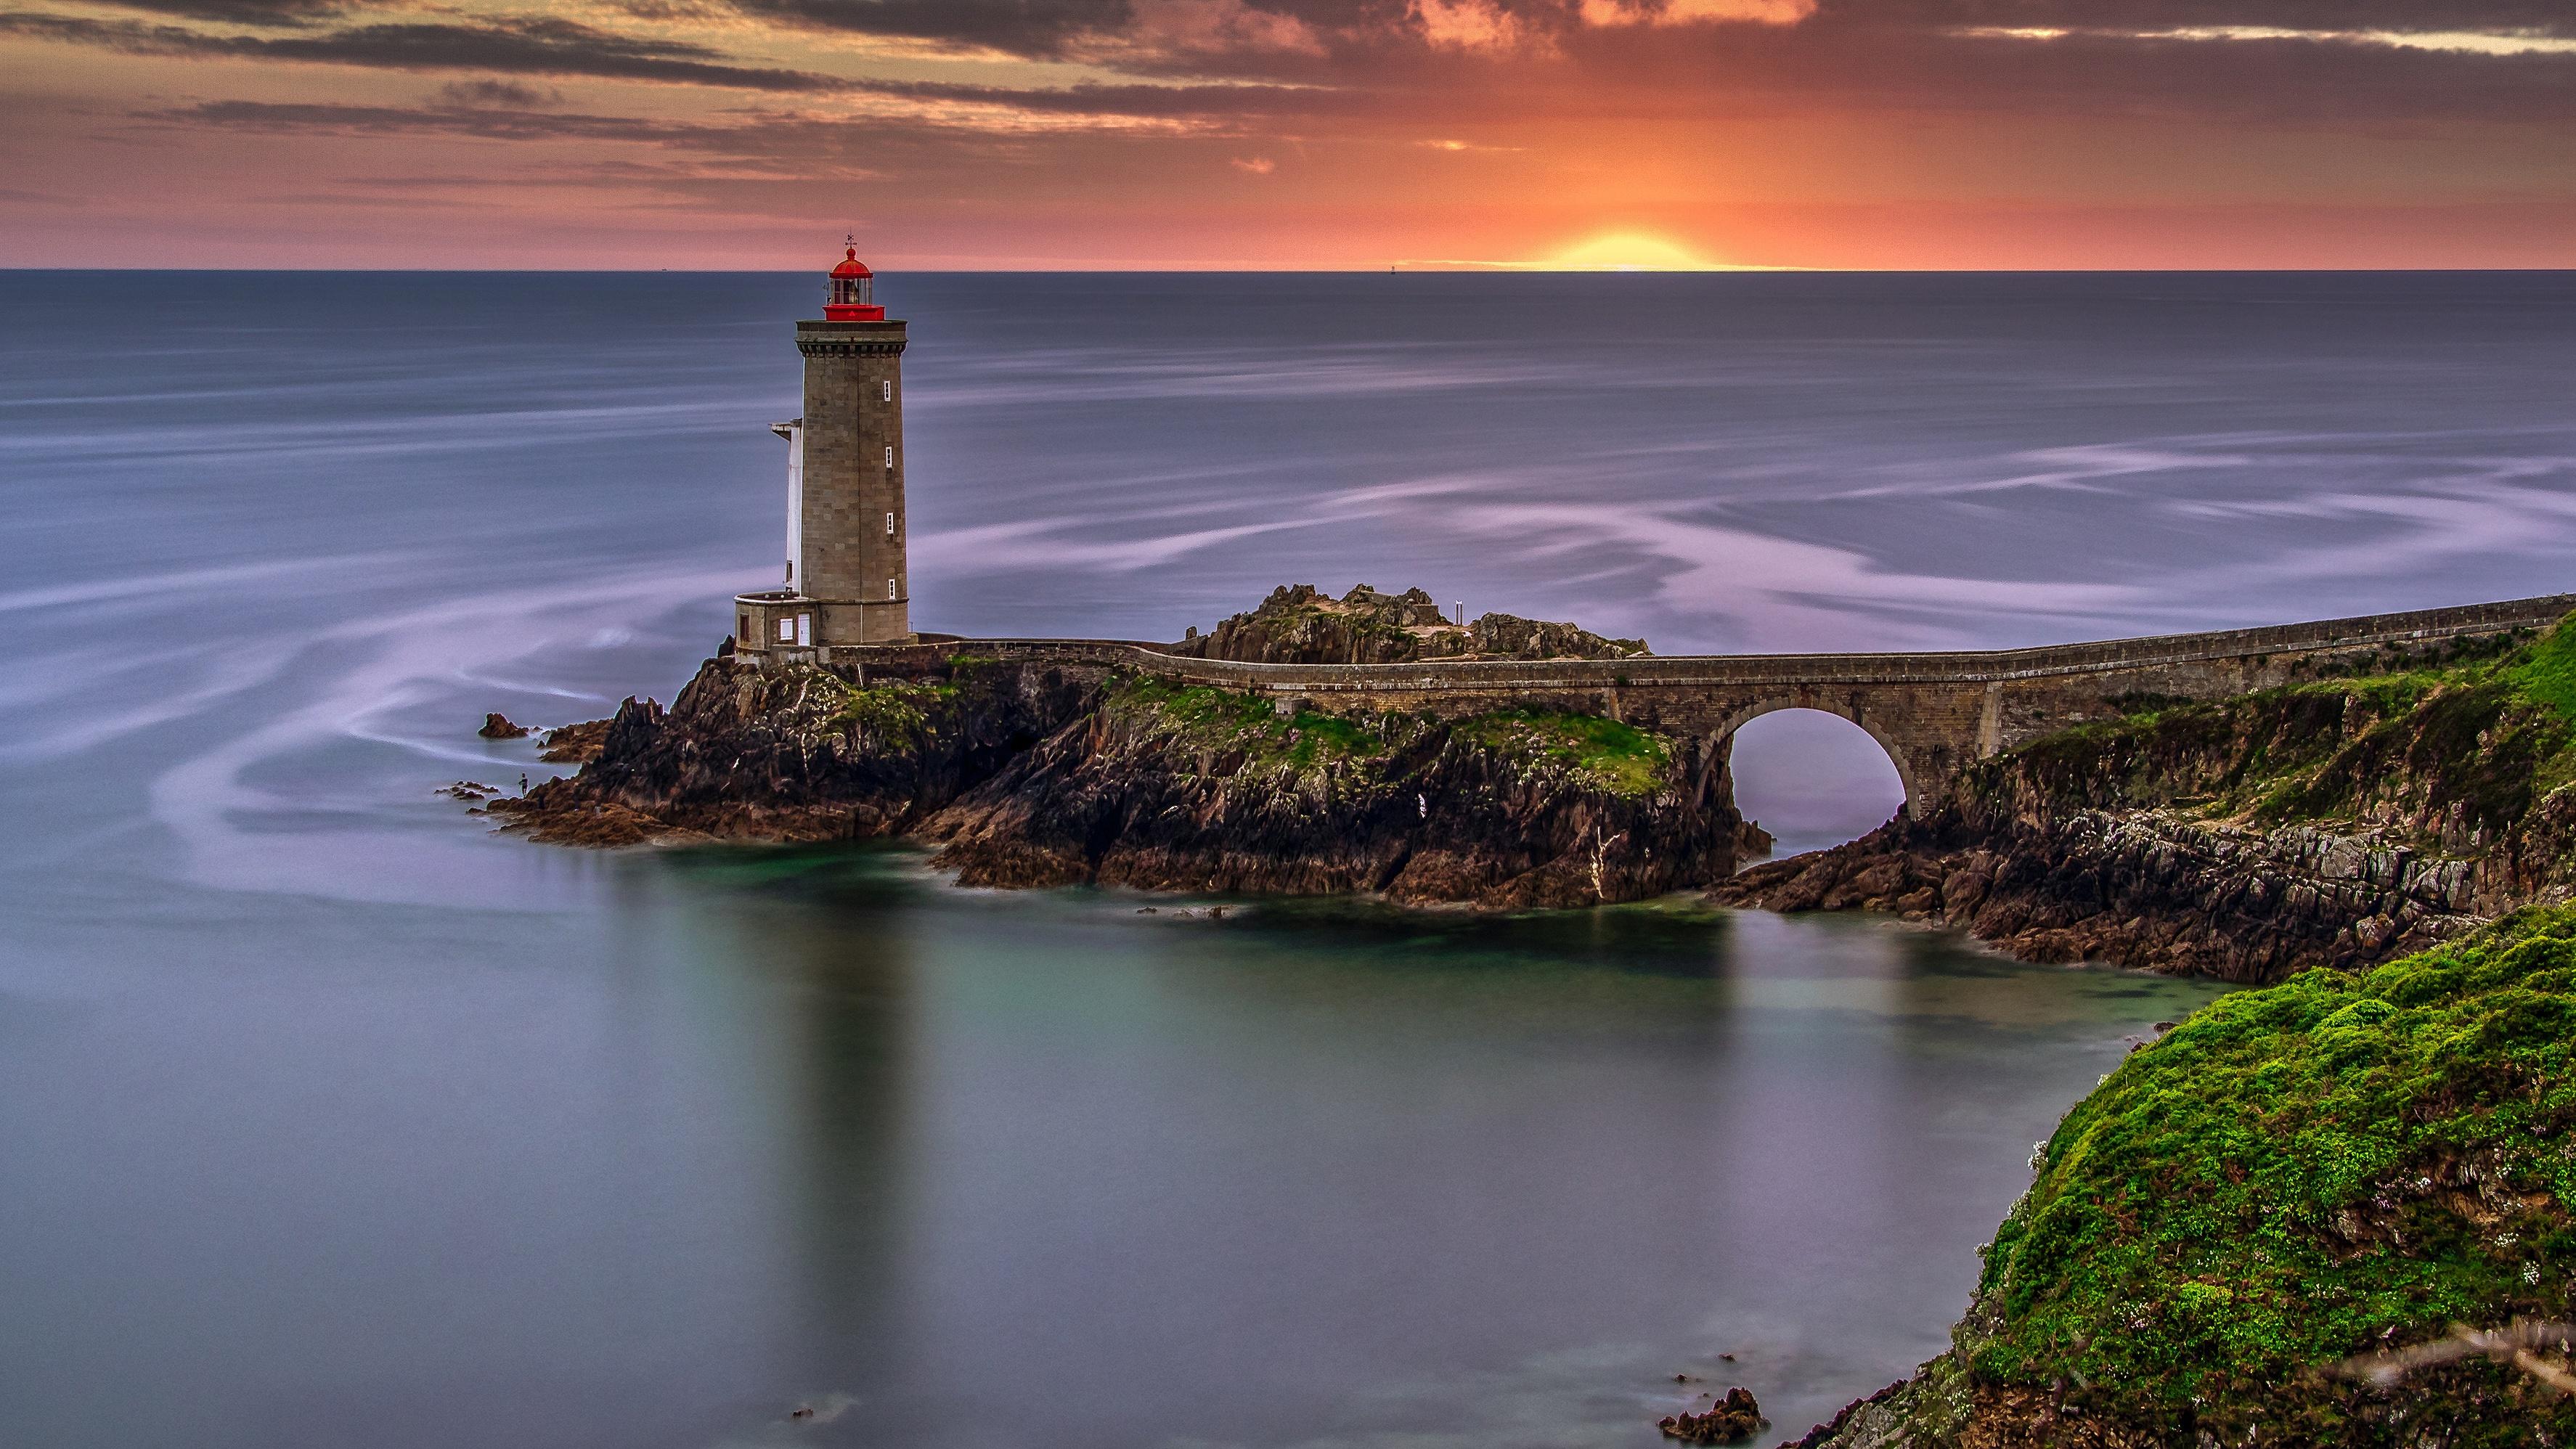 Sea Sunset France 3548x1996